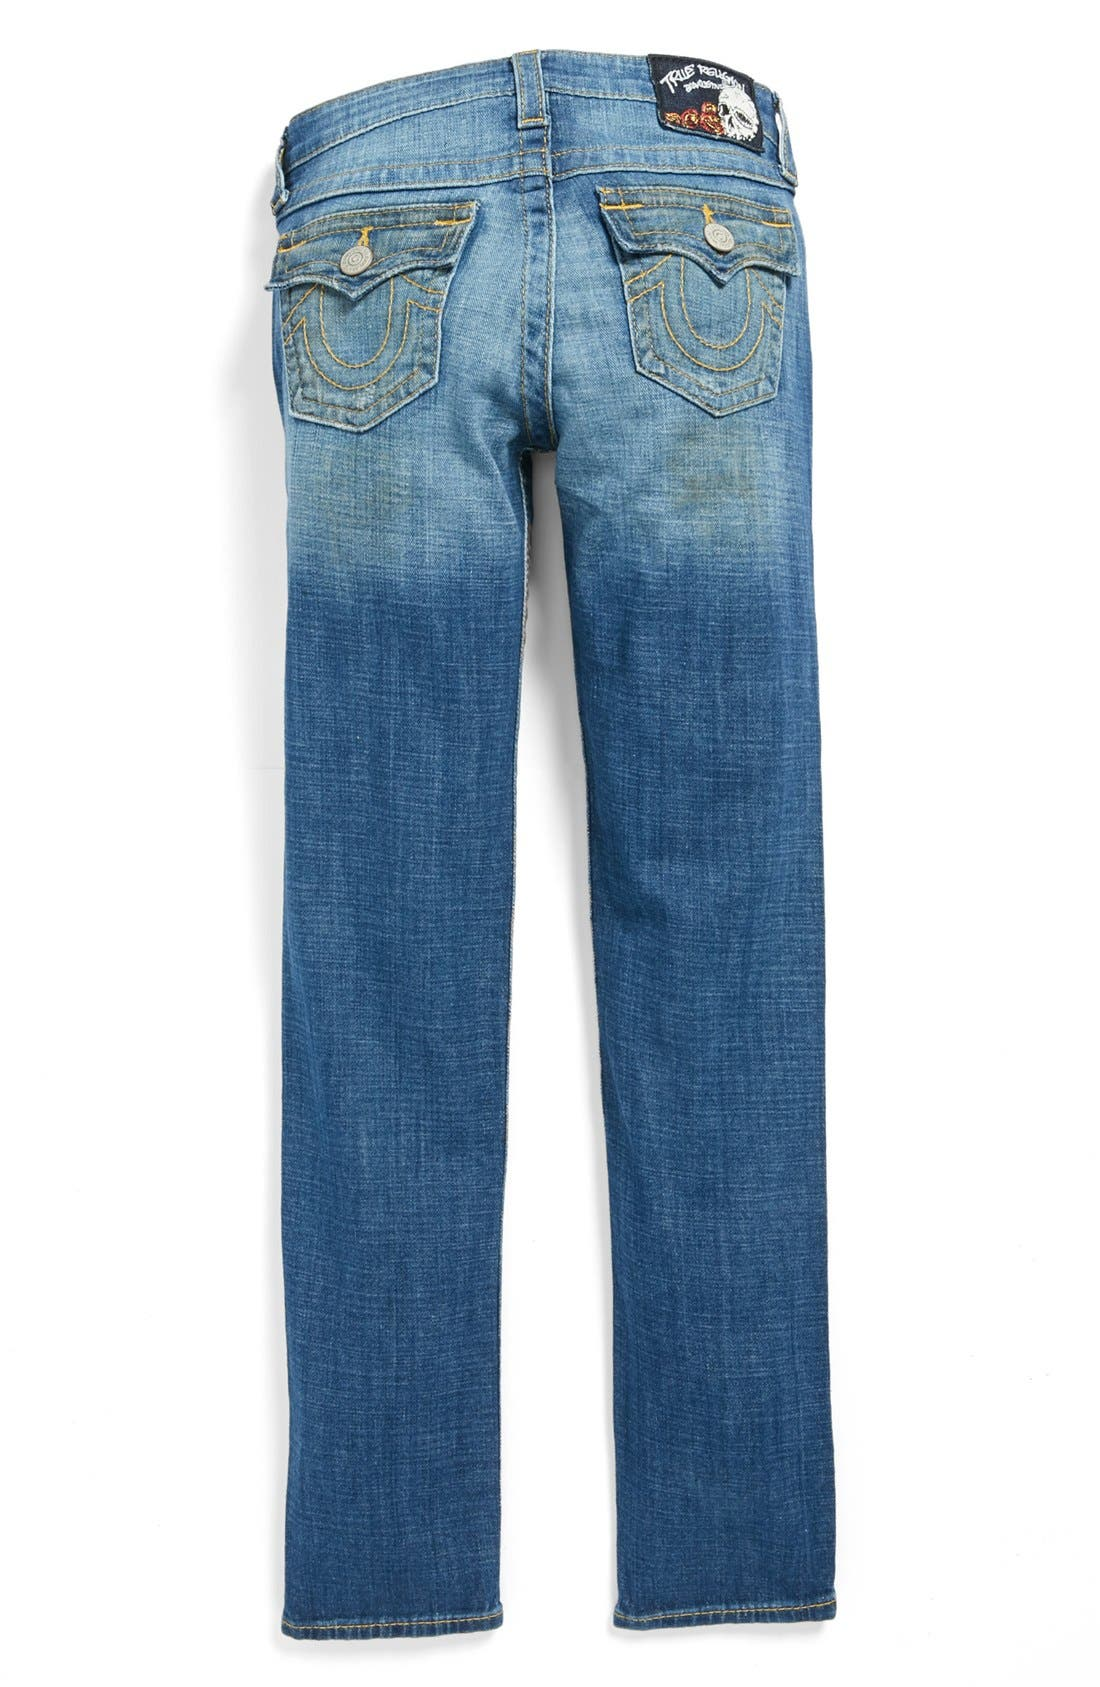 Alternate Image 1 Selected - True Religion Brand Jeans 'Julie' Straight Leg Jeans (Big Girls)